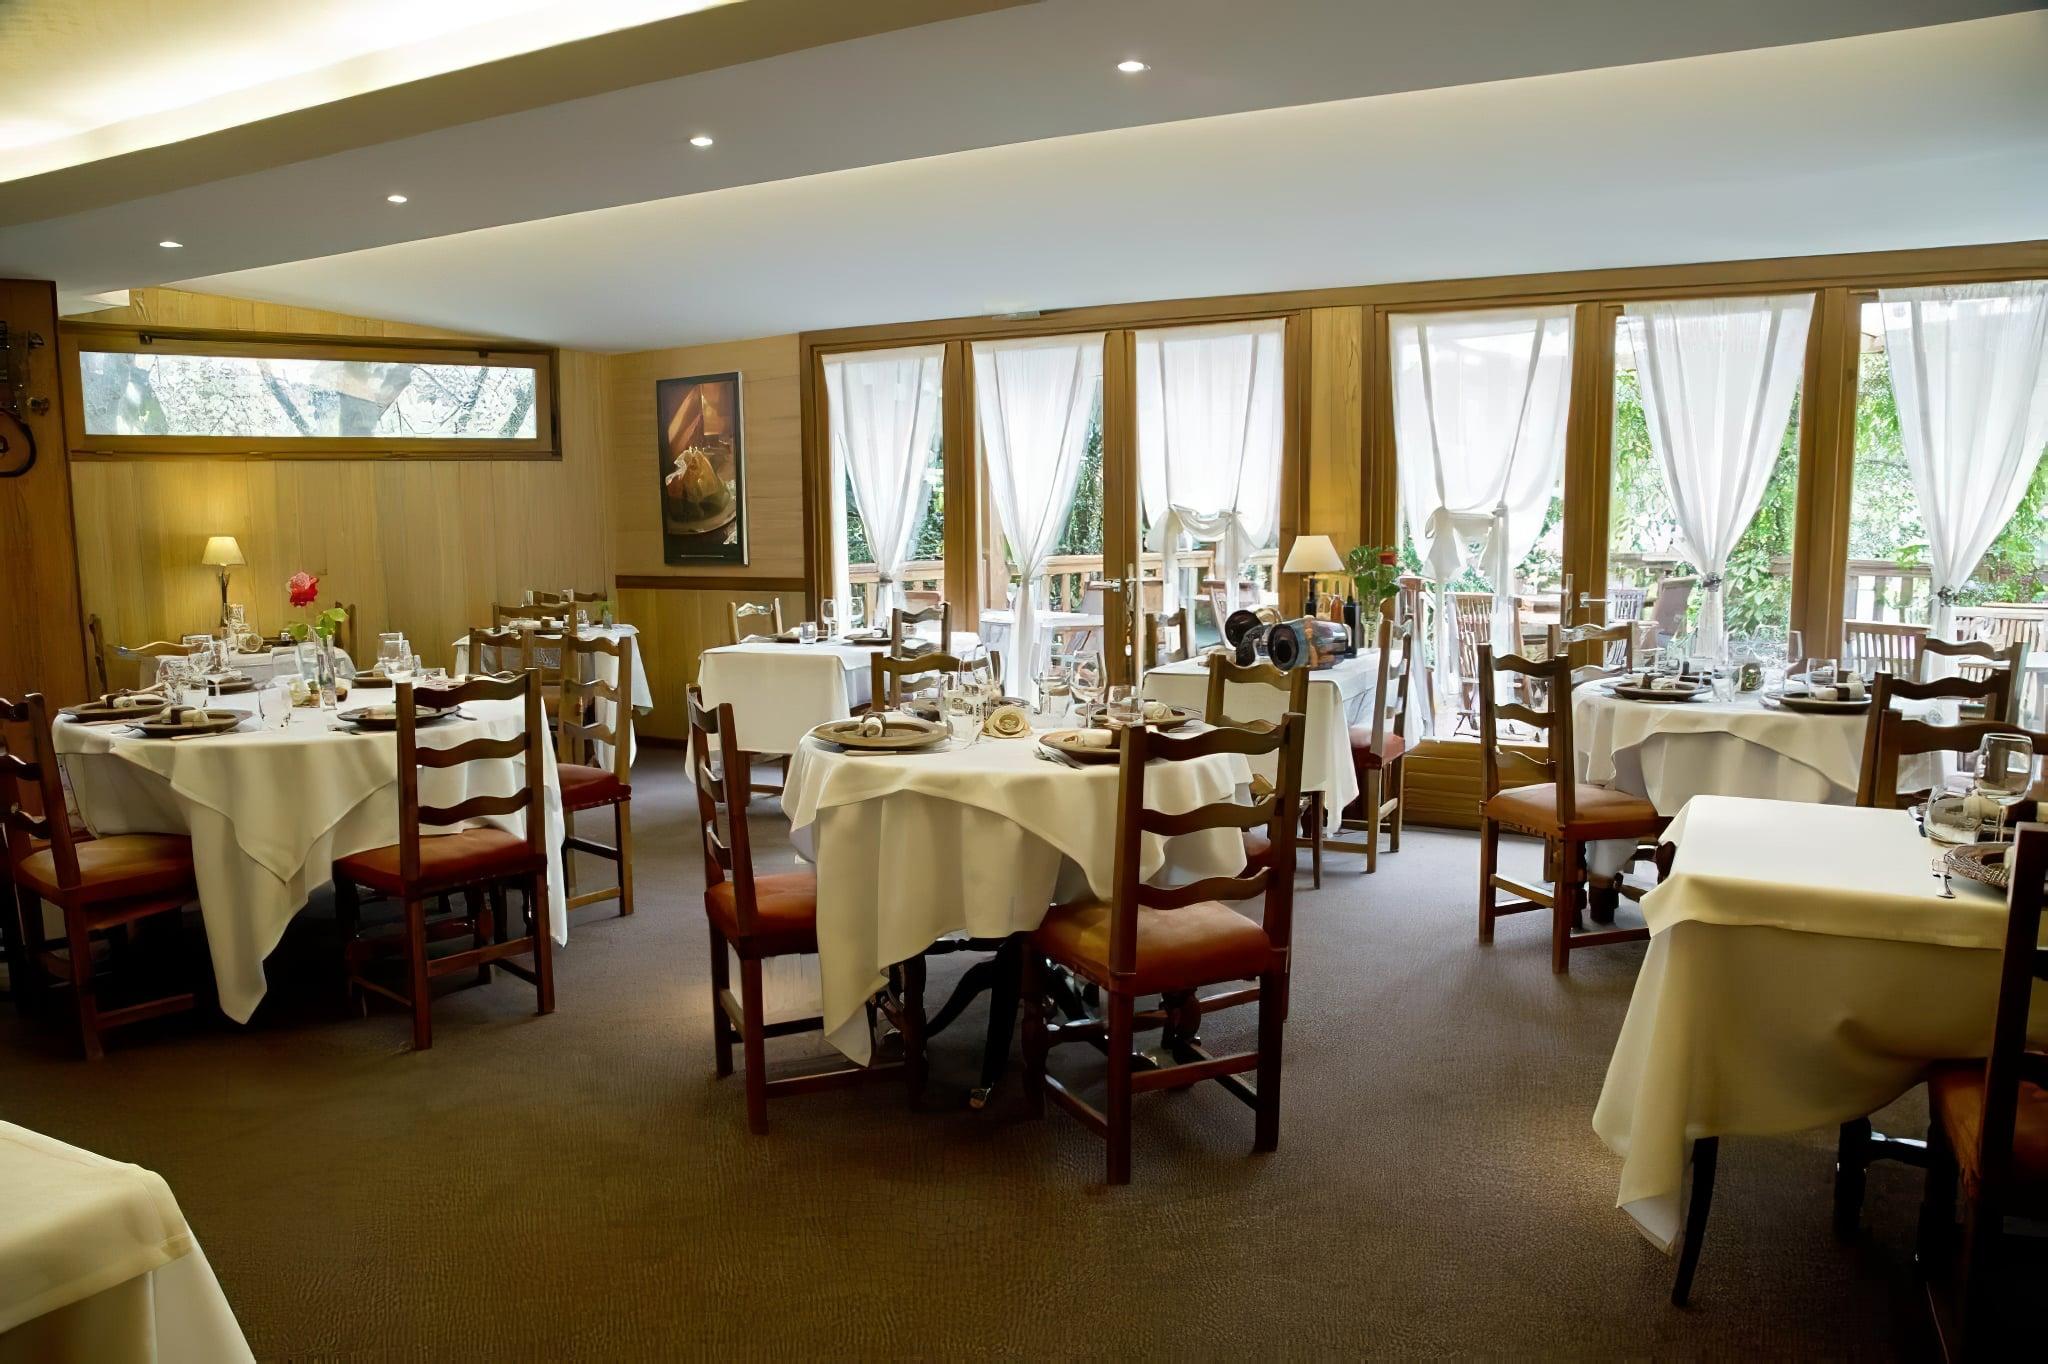 Où manger à Estaing ?